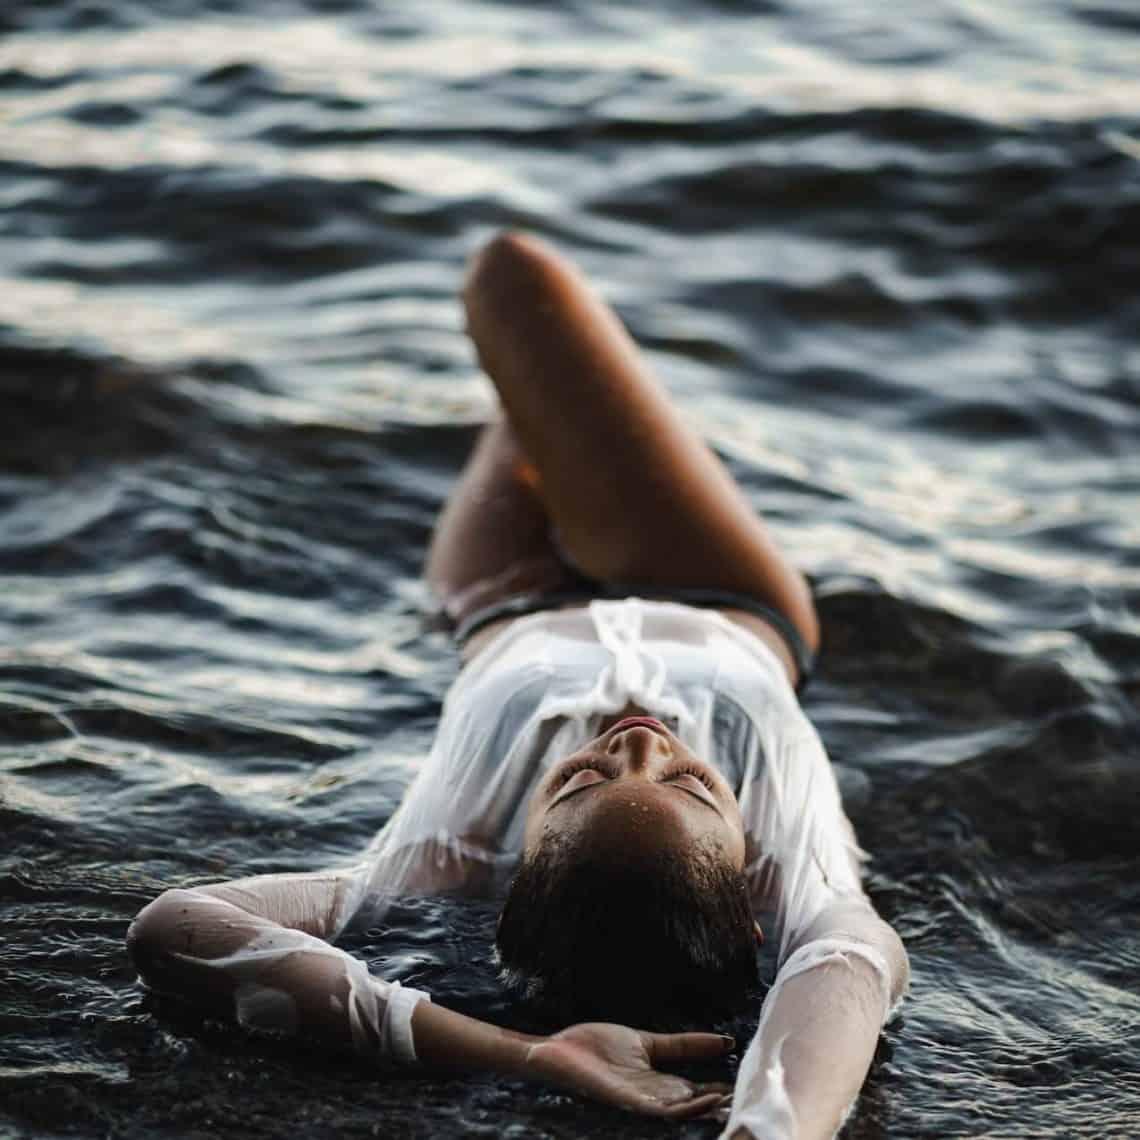 Sacral chakra woman in water enjoying pleasure and self-love.